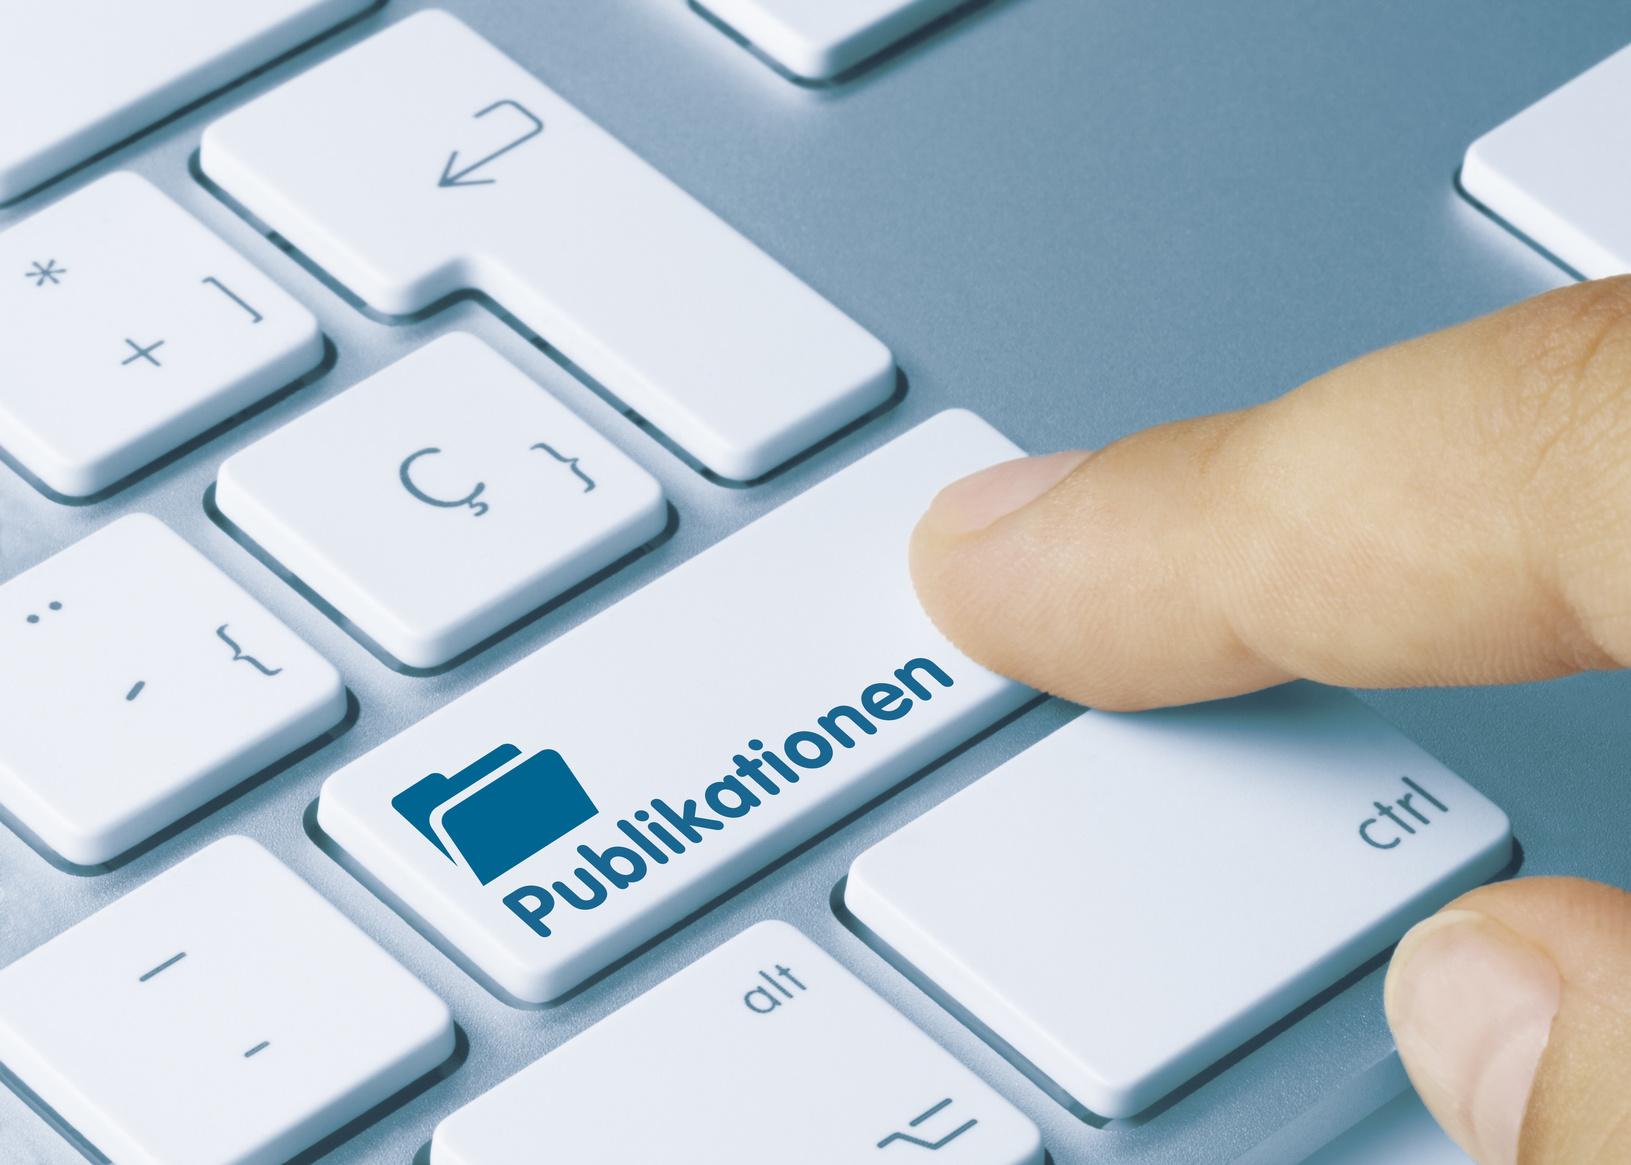 Tastatur mit Publikationen